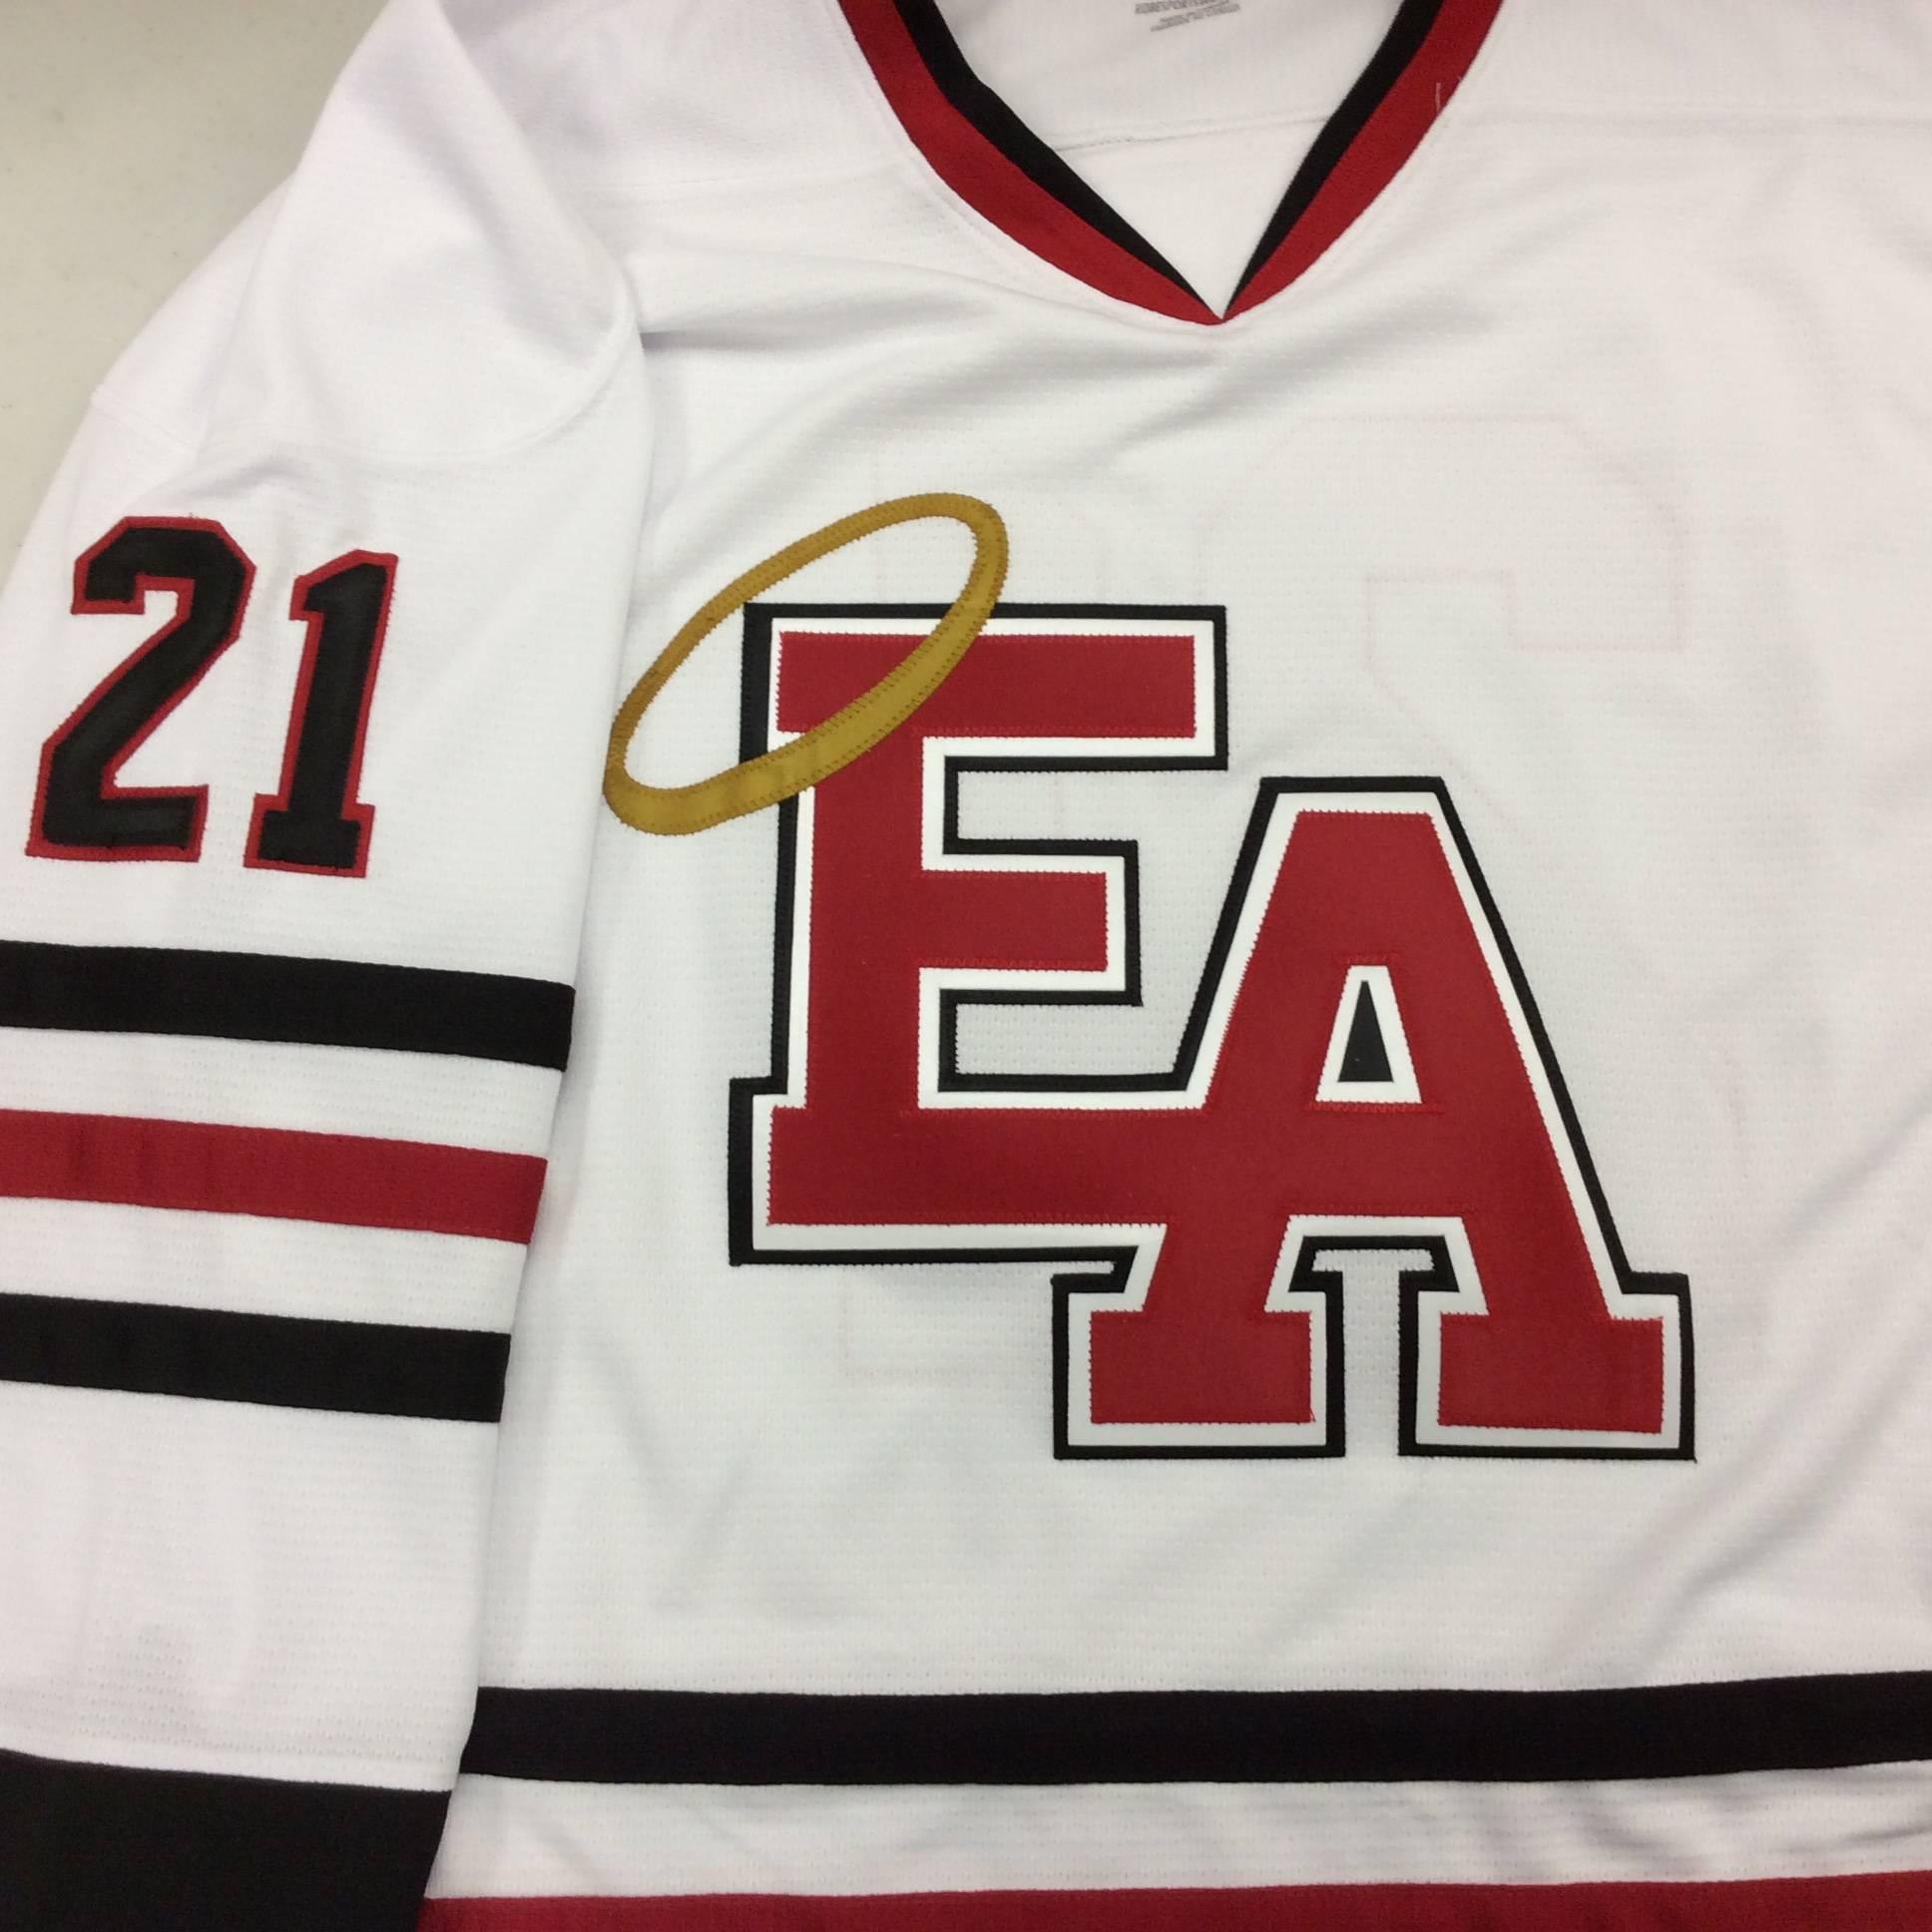 Custom Hockey Jersey With Layered Twill Crest on Kobe K3G06H Chicago Blackhawks White: Denver East Angels